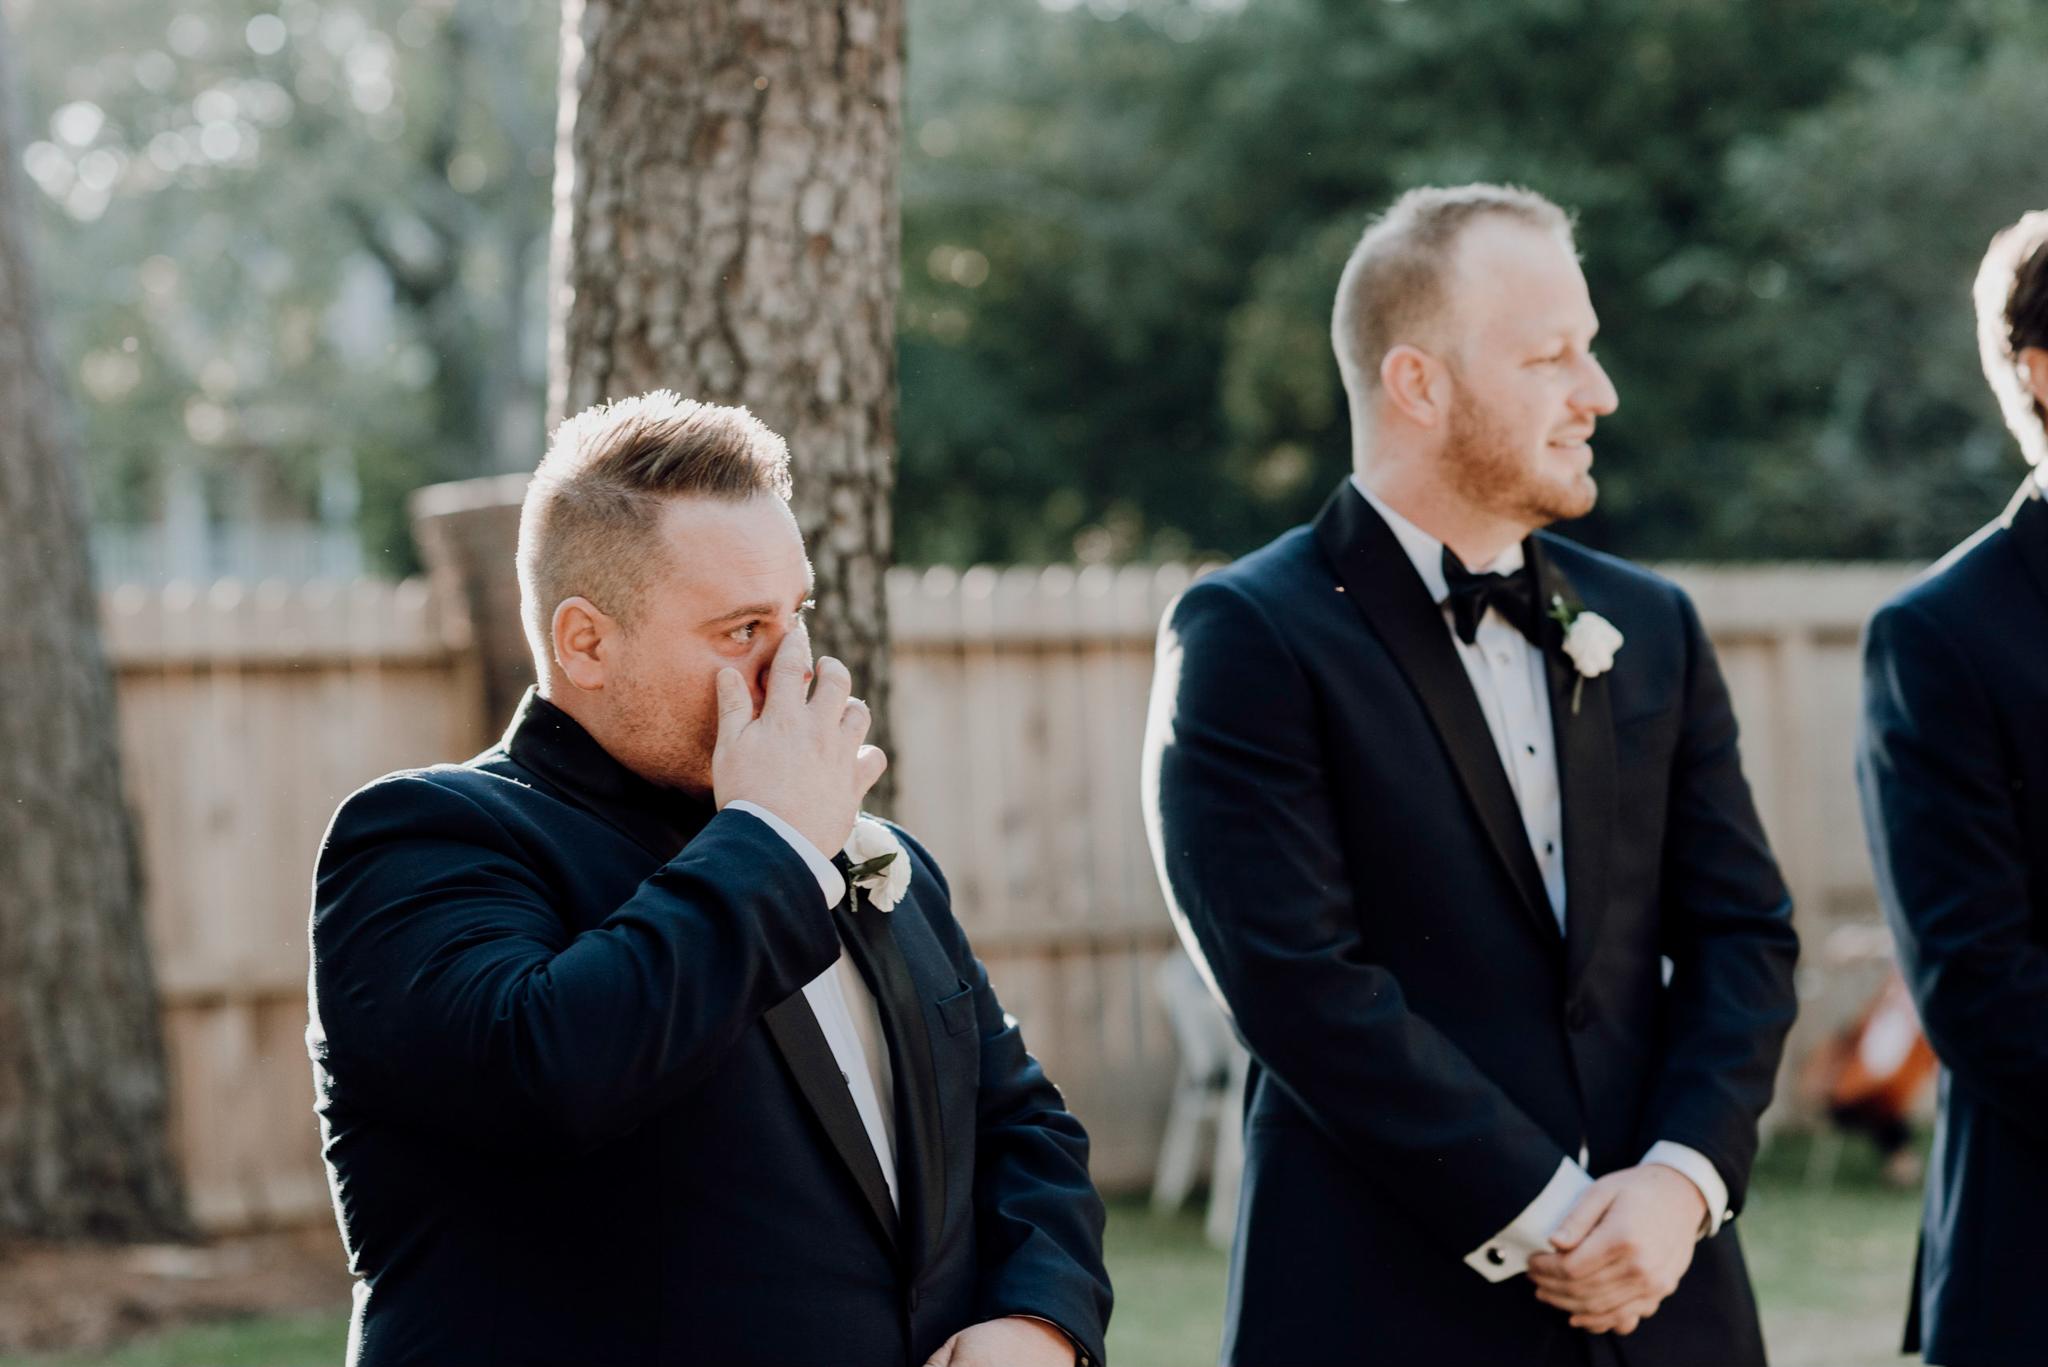 Houston Wedding Photographer-Intimate Texas Backyard Wedding- Houston Wedding Photographer -Kristen Giles Photography-36.jpg